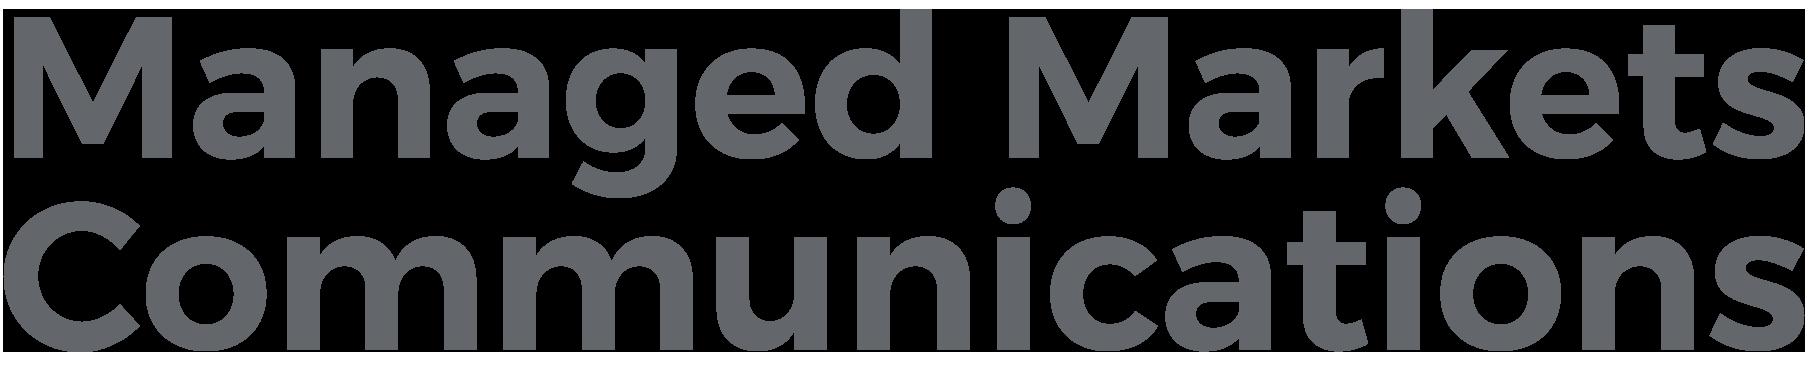 Managed Markets logo